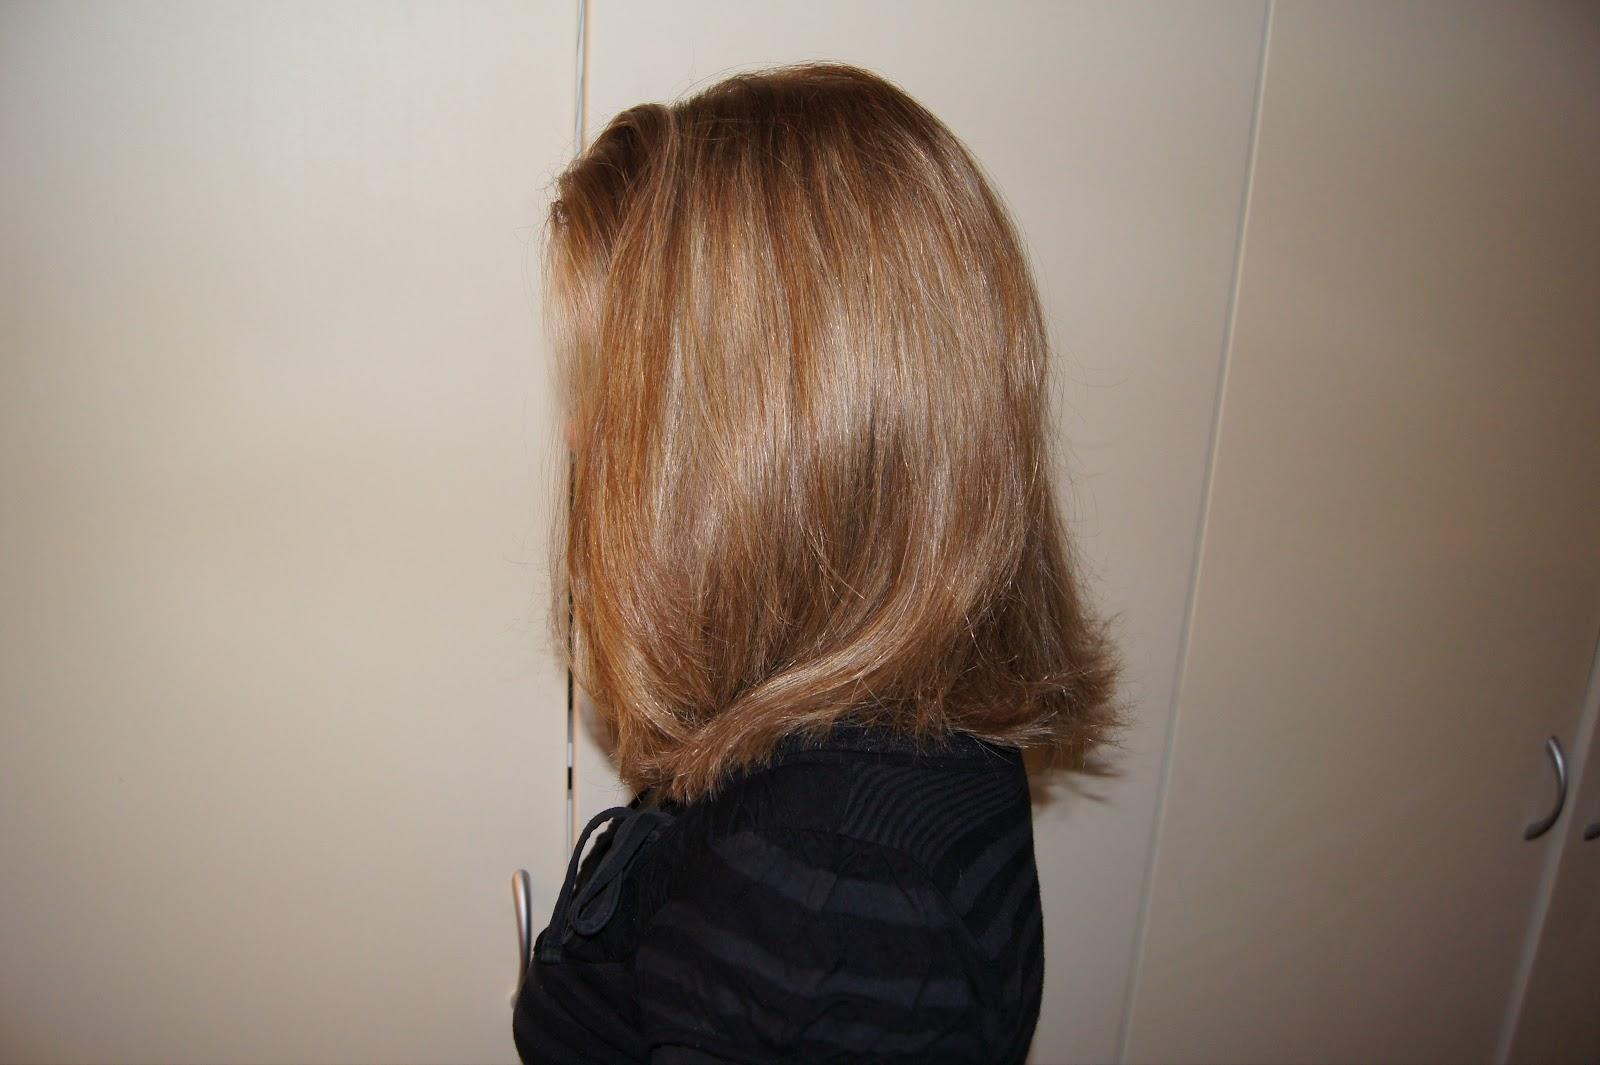 mademoiselle ludi aujourd 39 hui j 39 ai test la coloration pr f rence les blondissimes de l 39 or al. Black Bedroom Furniture Sets. Home Design Ideas